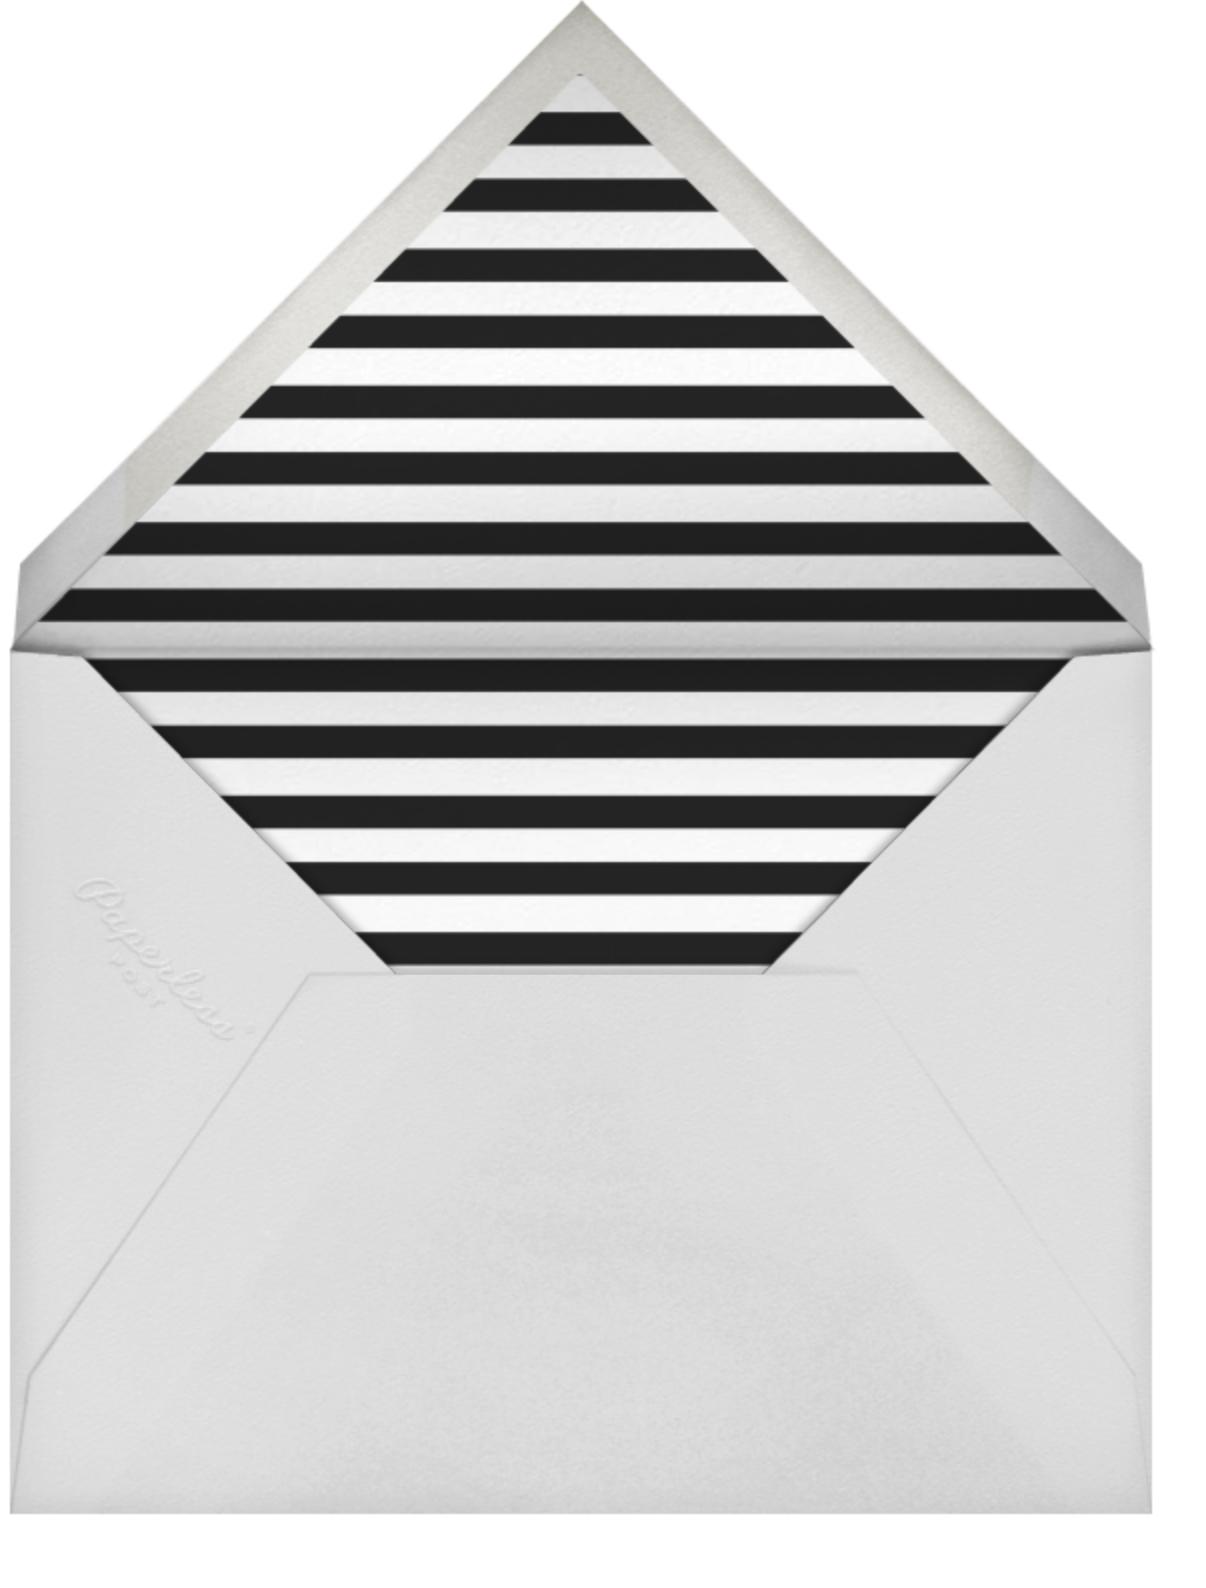 Pop Fizz Clink (Square) - Black/Silver - kate spade new york - Winter parties - envelope back